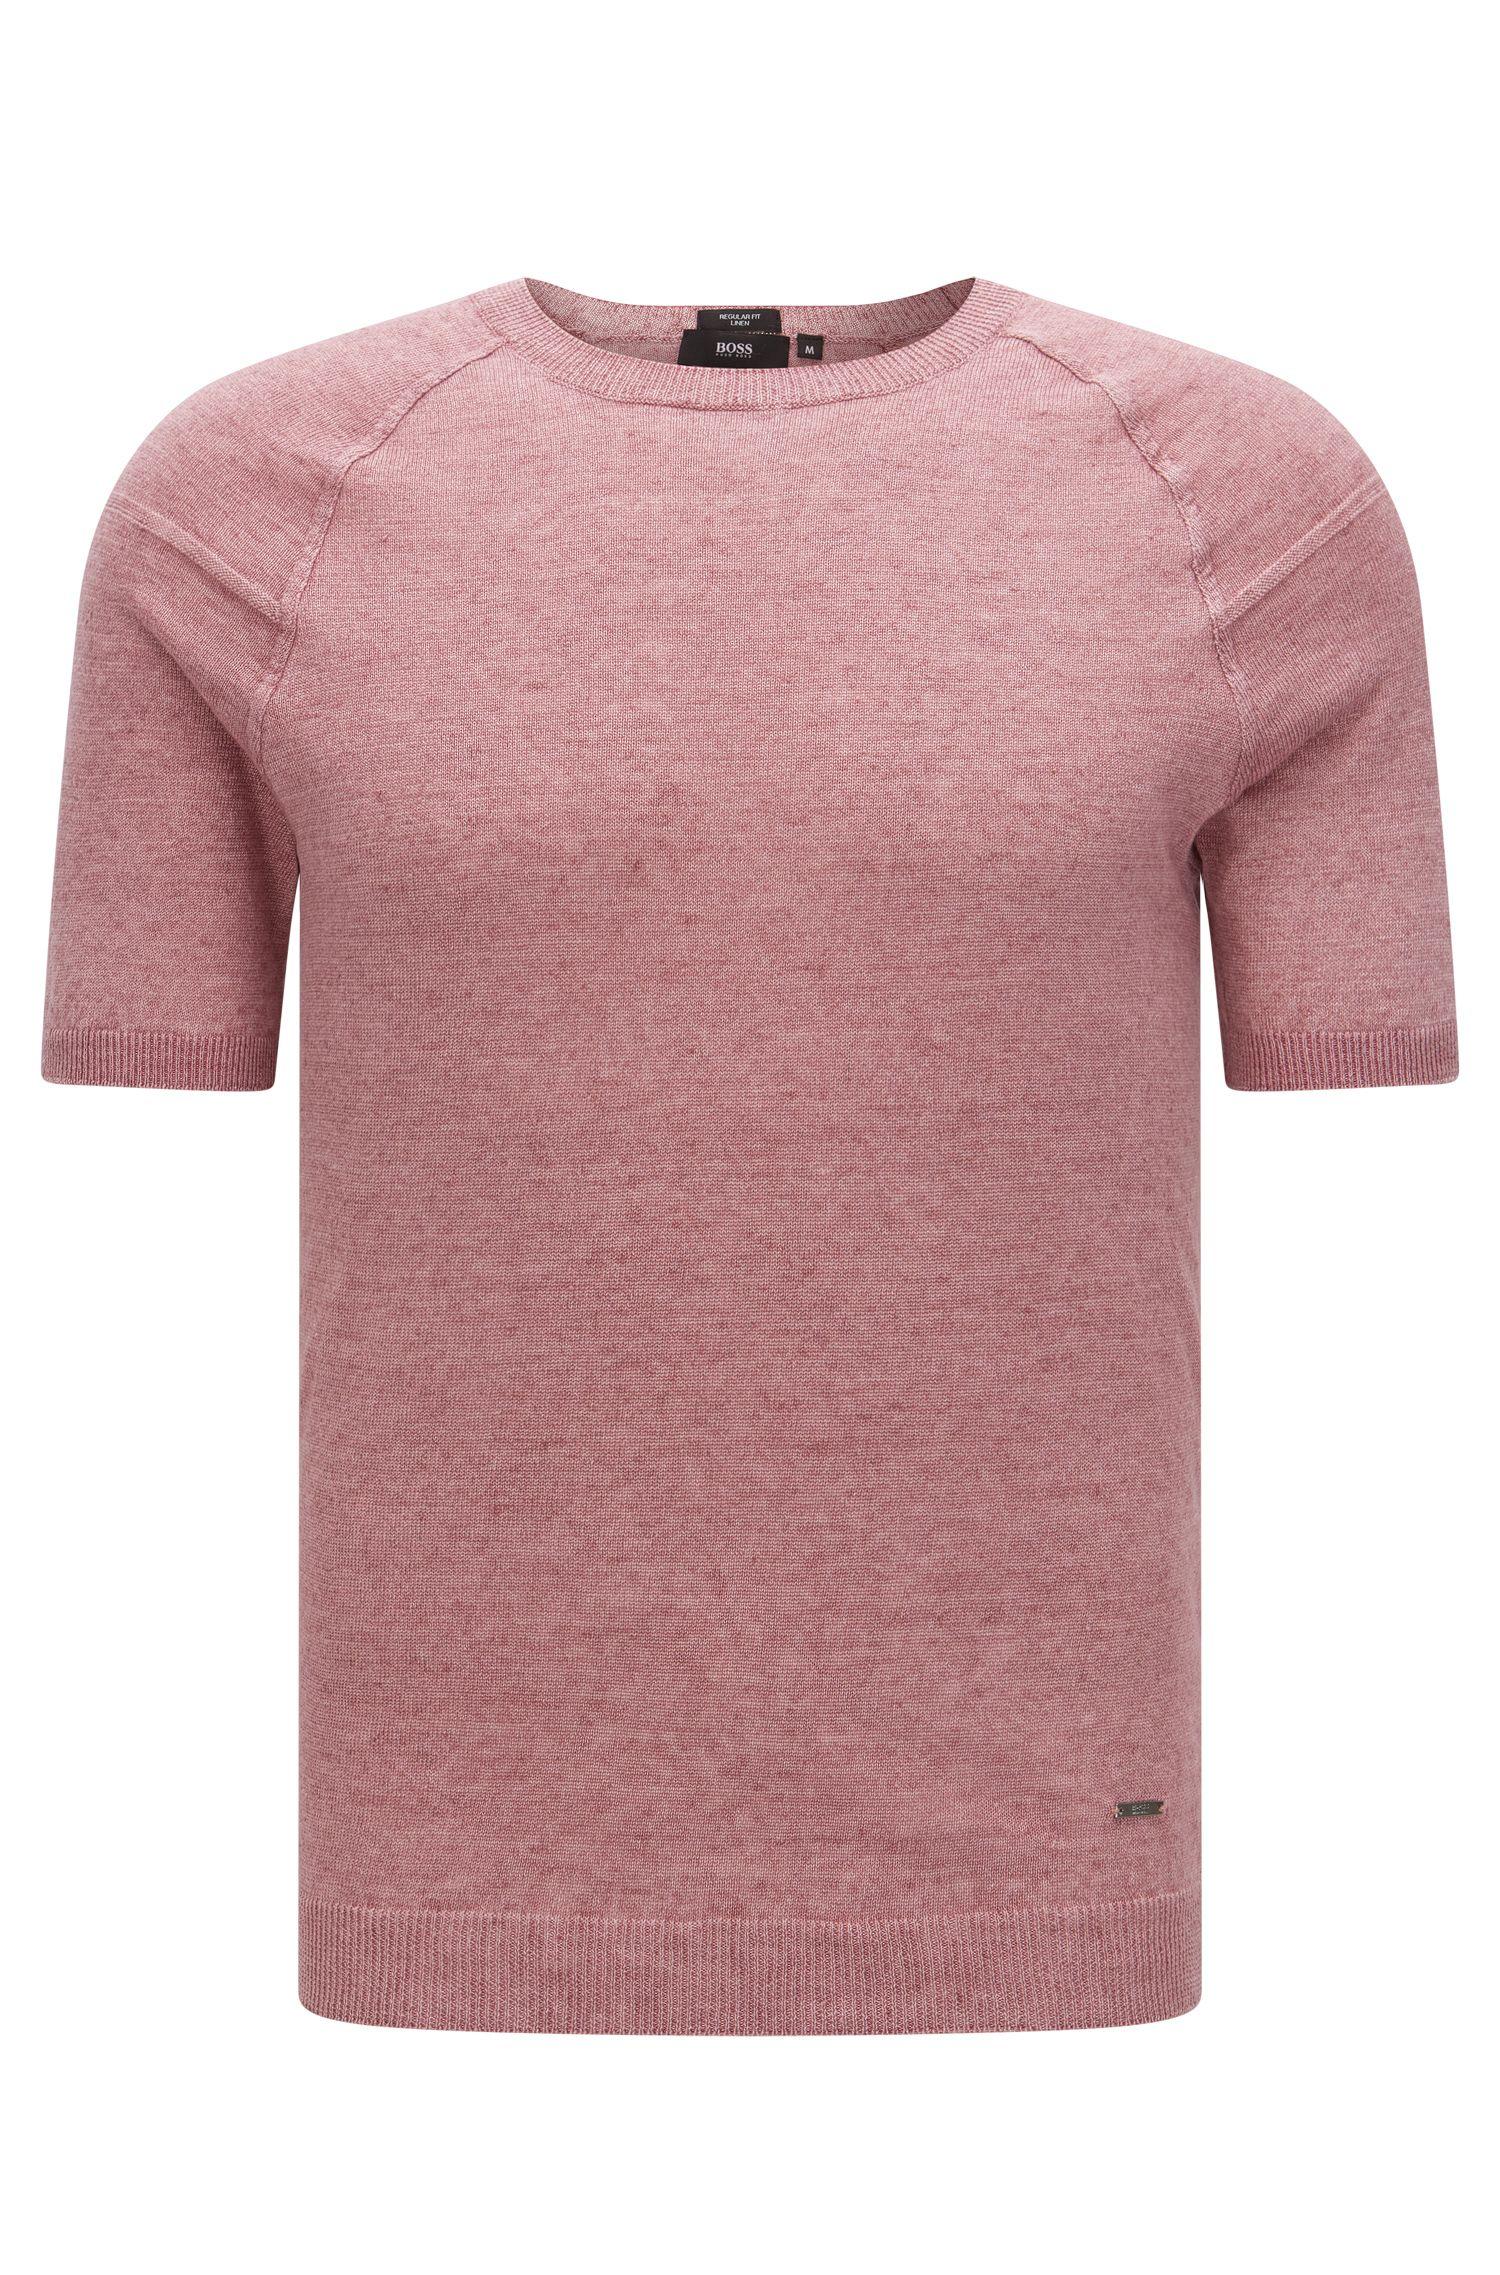 'Olvin' | Délavé Linen Raglan T-Shirt